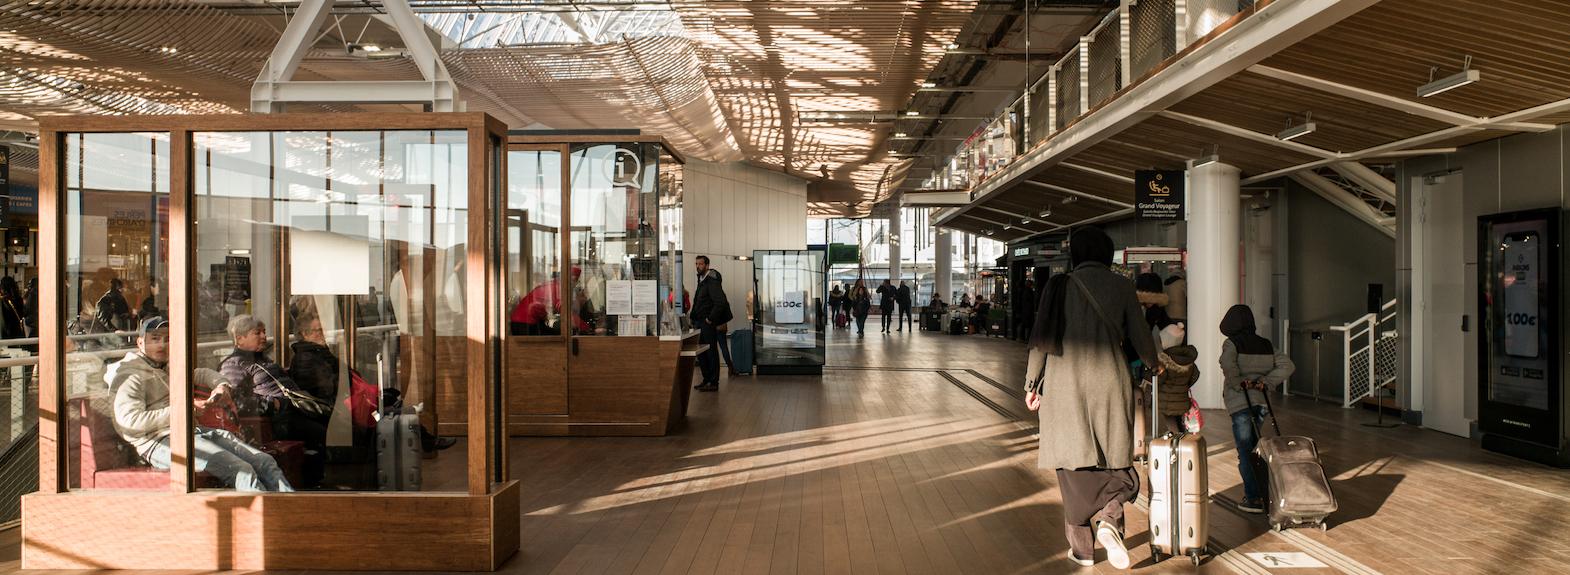 14-Gare_interieur-fevrier_2019.jpg